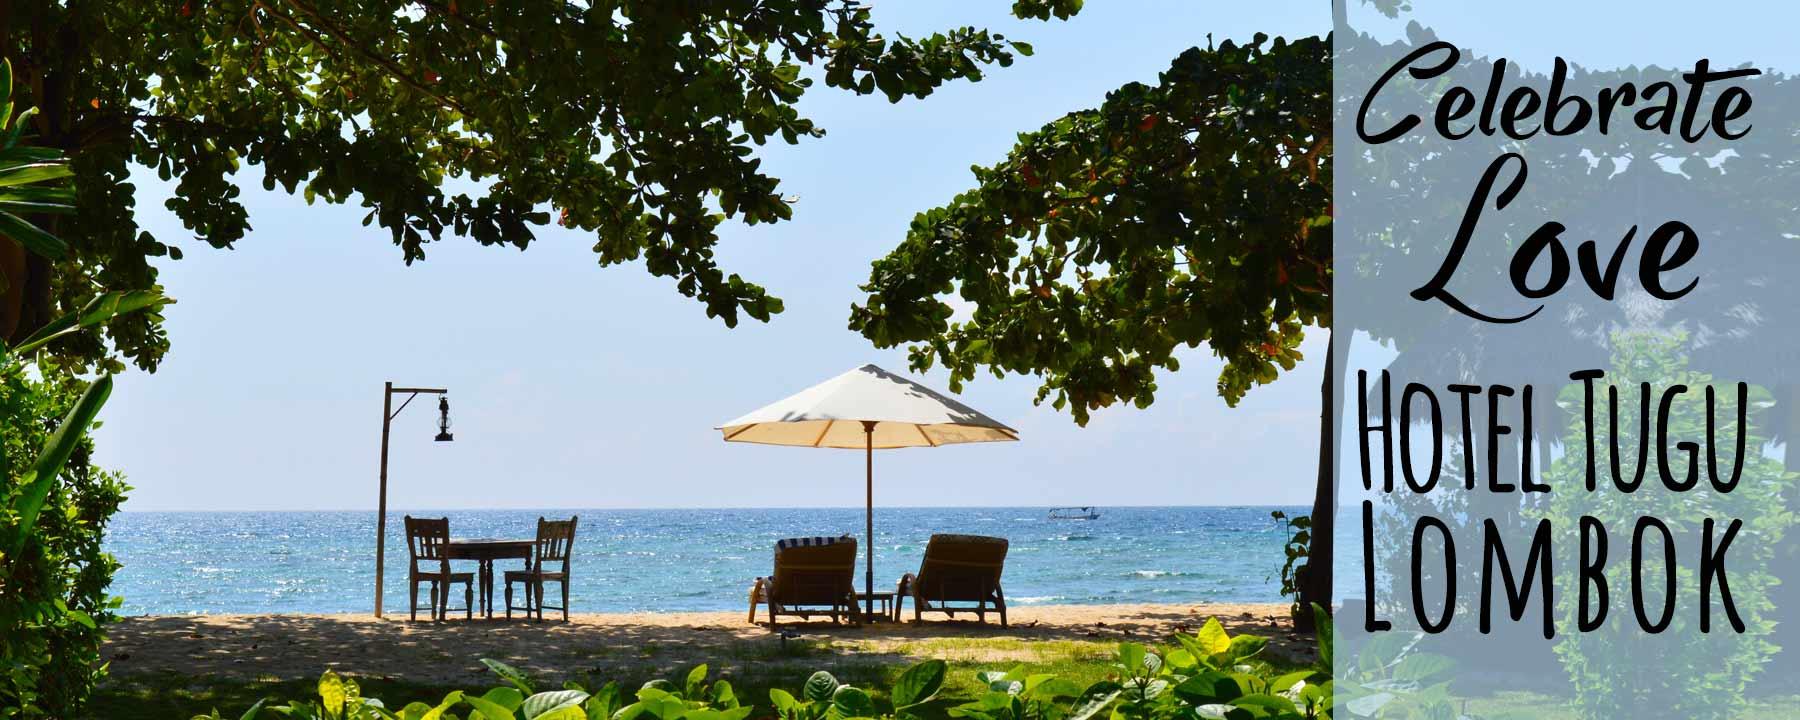 Hotel Tugu Lombok Beachfront Villas – Disconnect in Luxurious Style